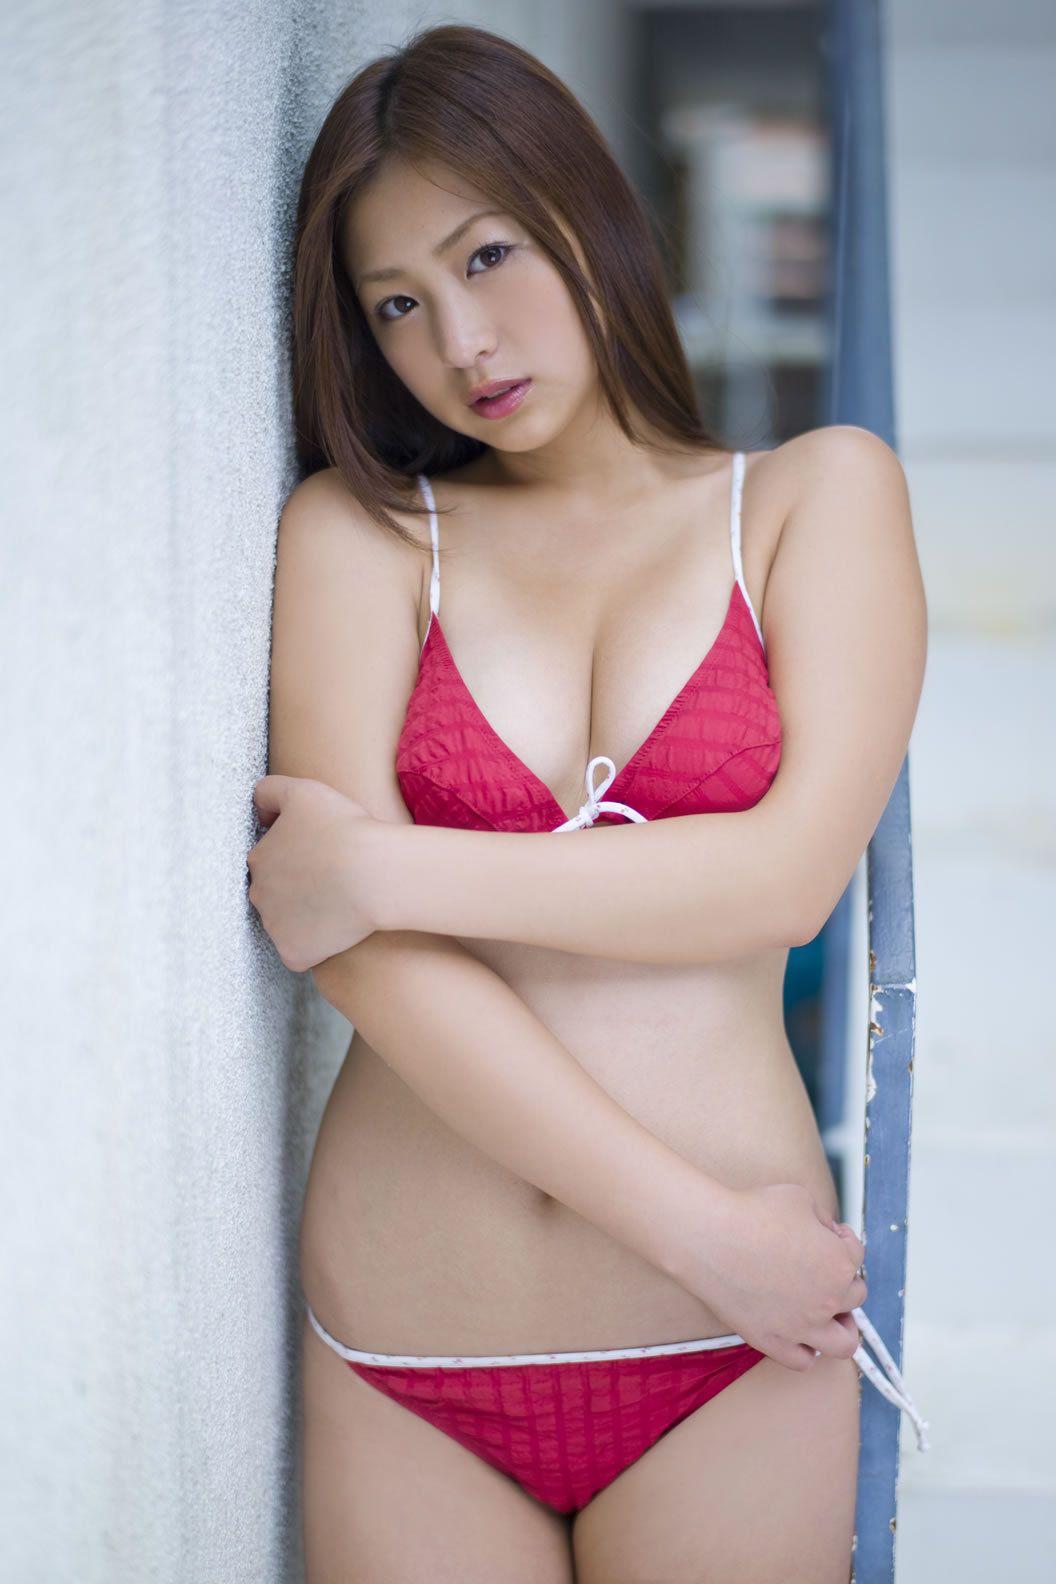 Ayaka Sayama (b. 1993)